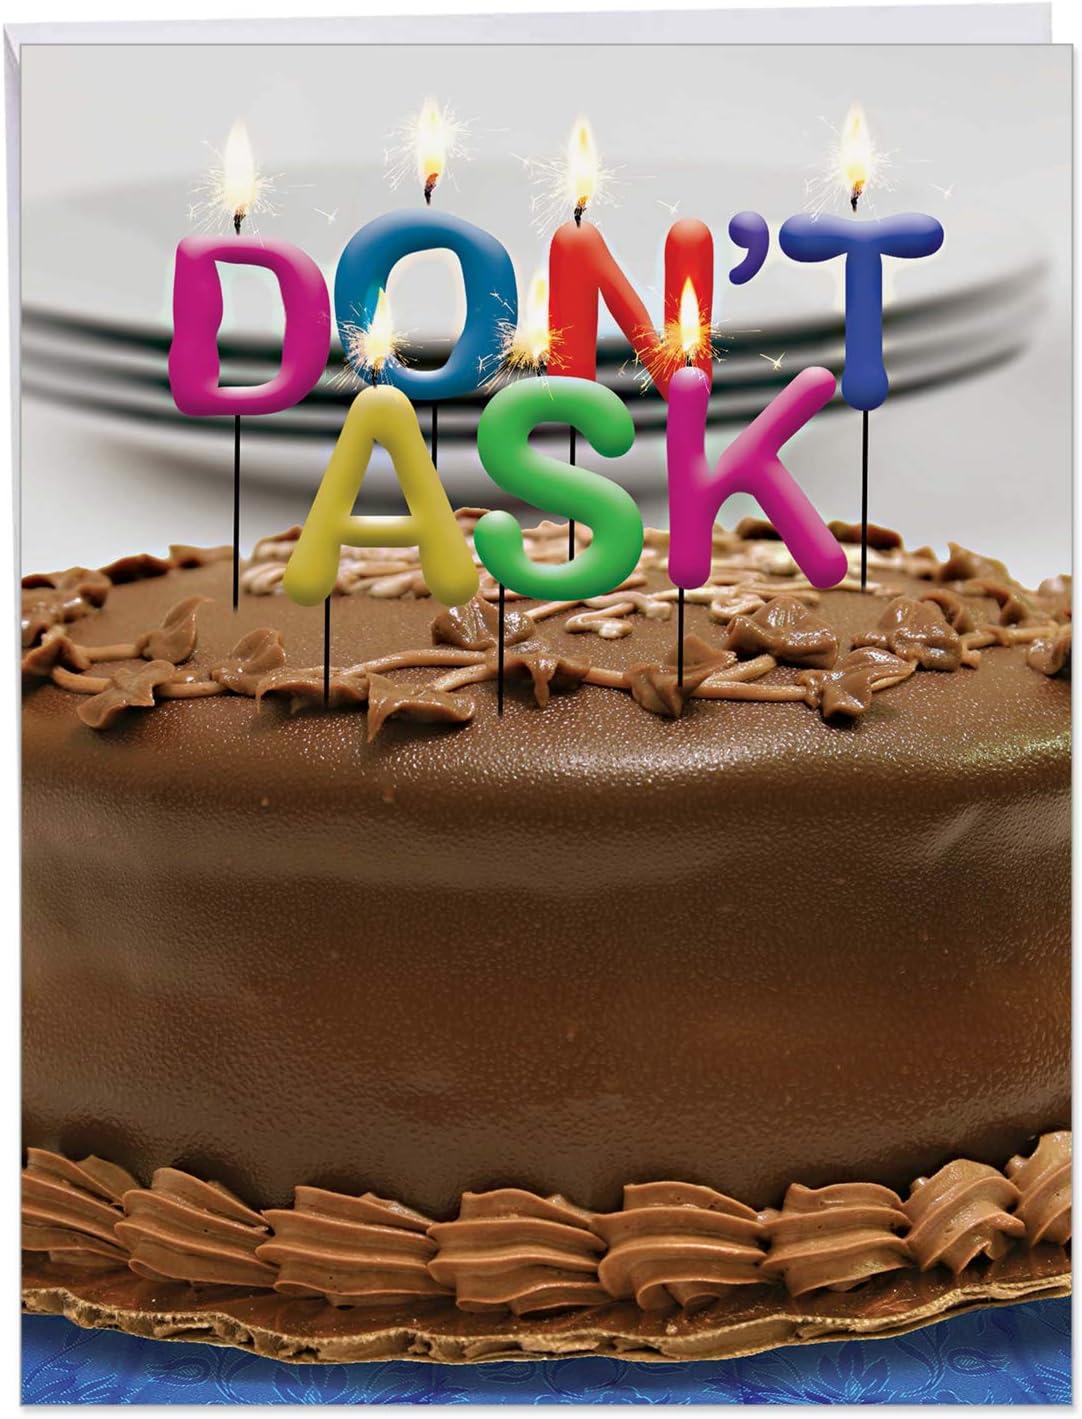 Incredible Amazon Com Big Funny Birthday Card Photo Of Candles On A Cake Funny Birthday Cards Online Inifodamsfinfo